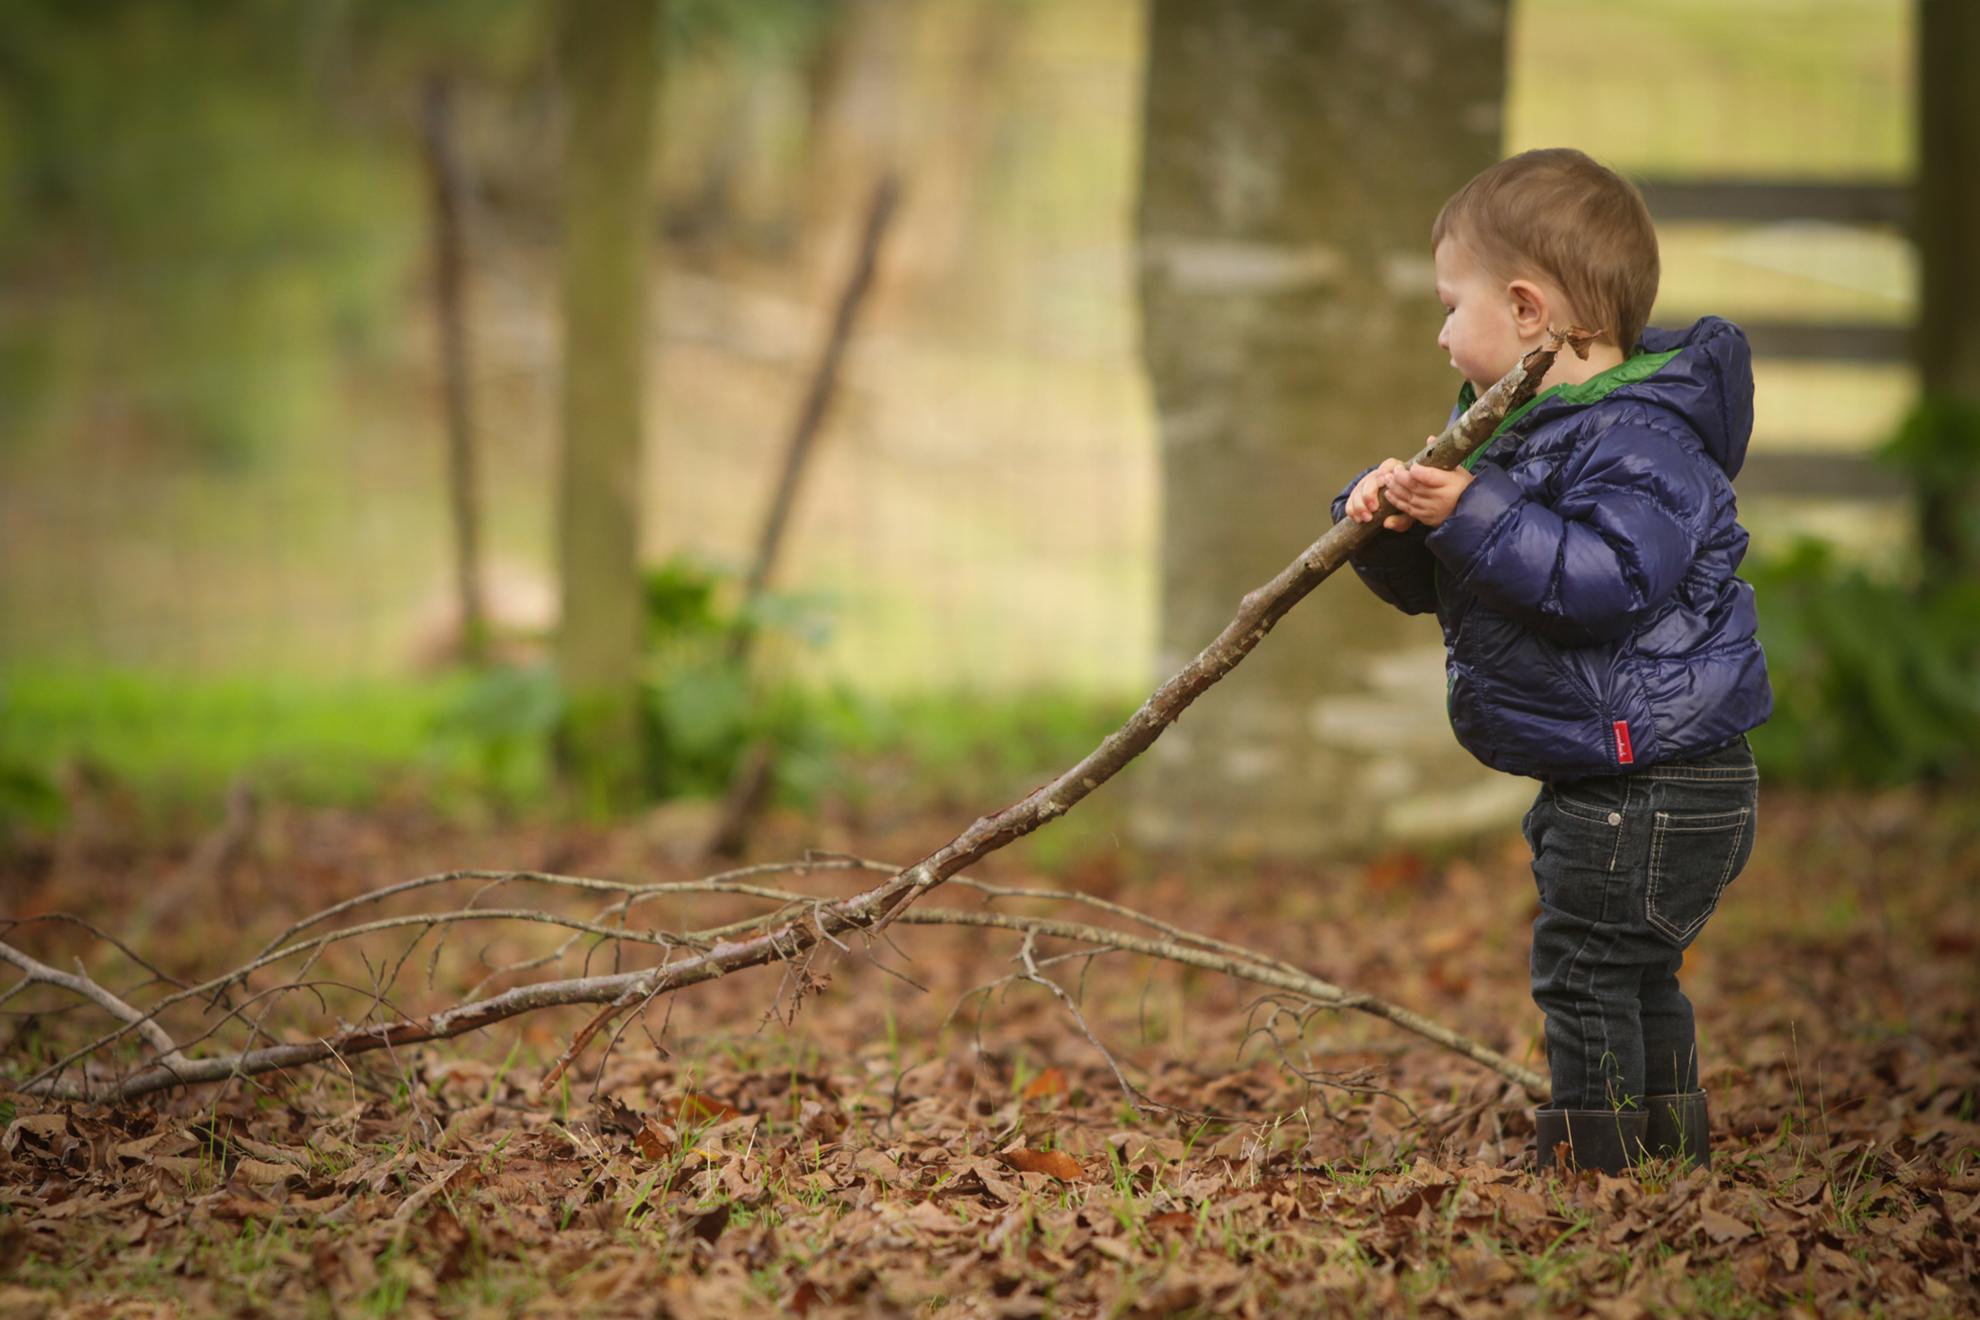 Hamilton-photographer-child-playing-with-sticks.jpg